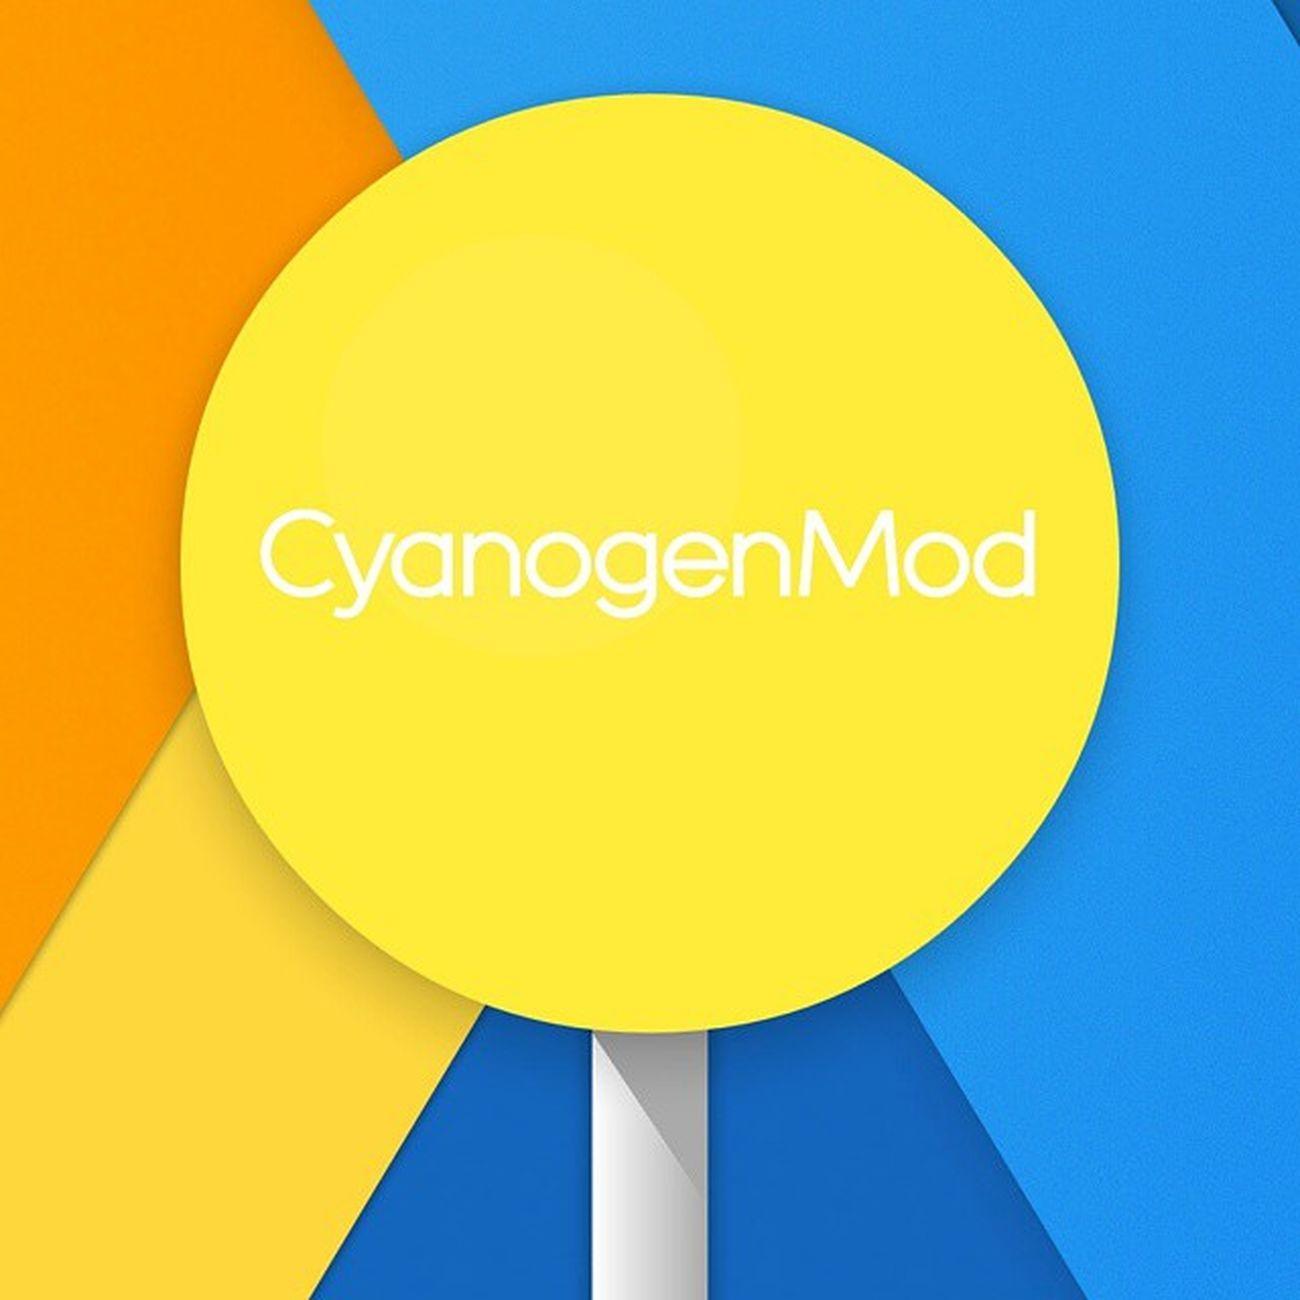 Cyanogenmod Nexus5 Android Fine